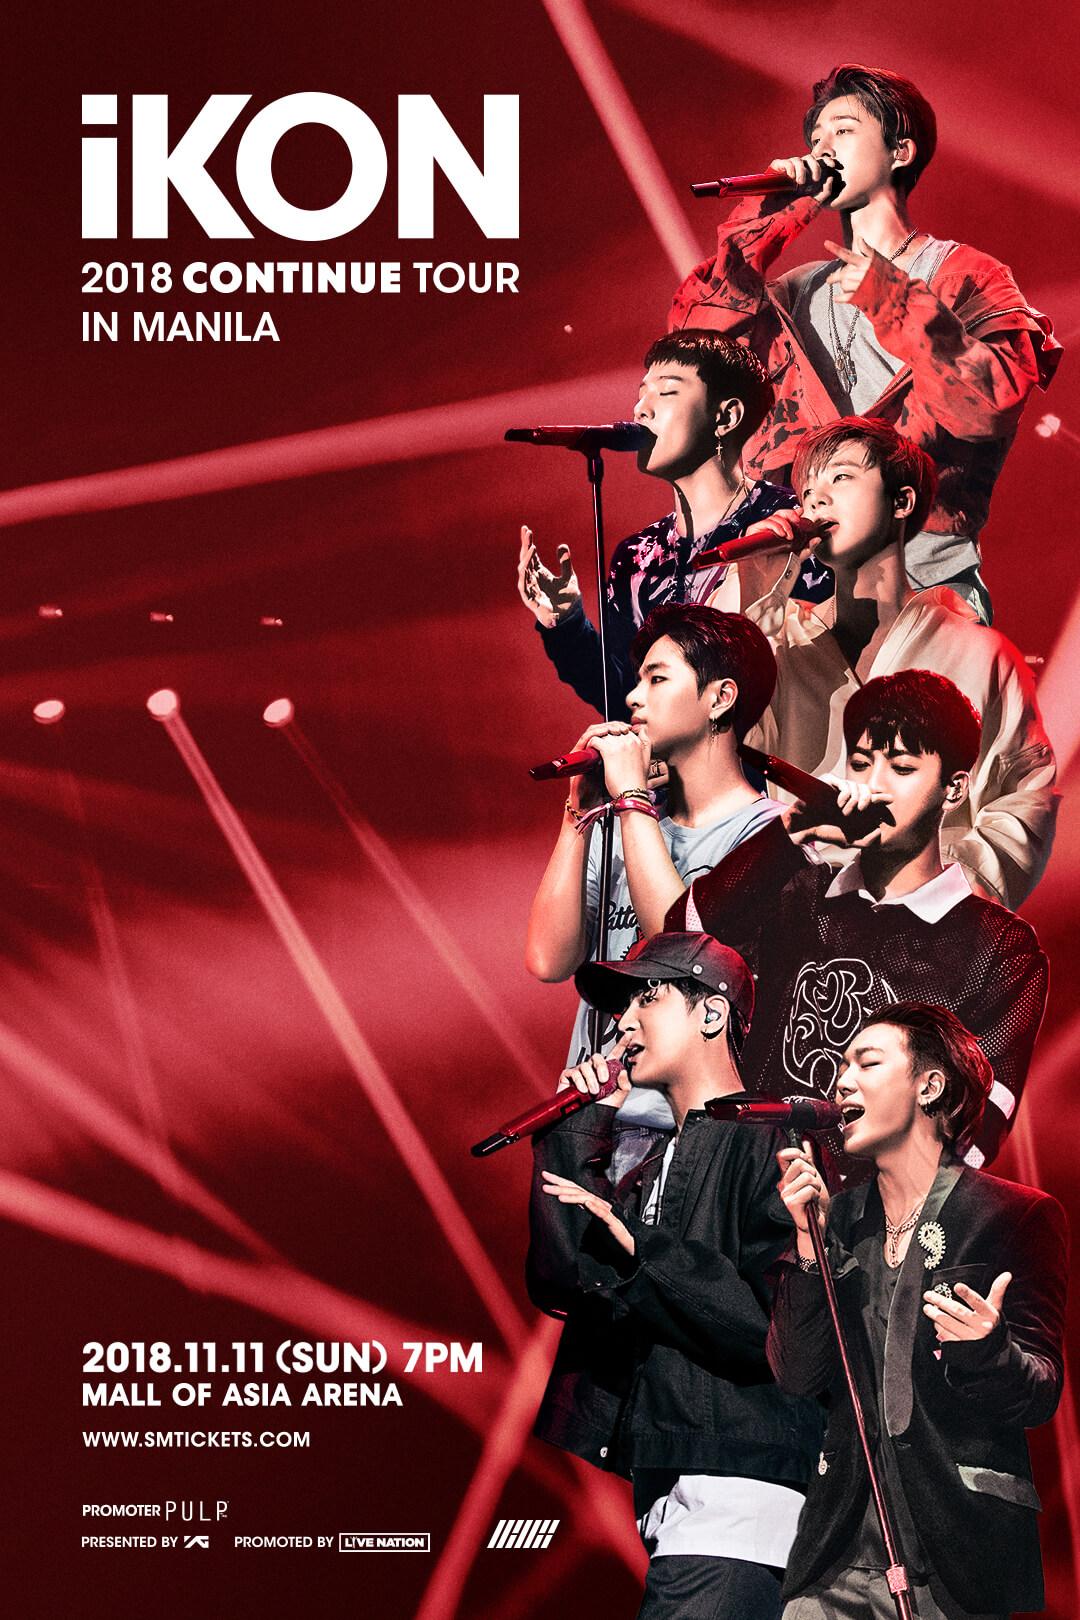 iKON 2018 CONTINUE TOUR IN MANILA - PULP Live World